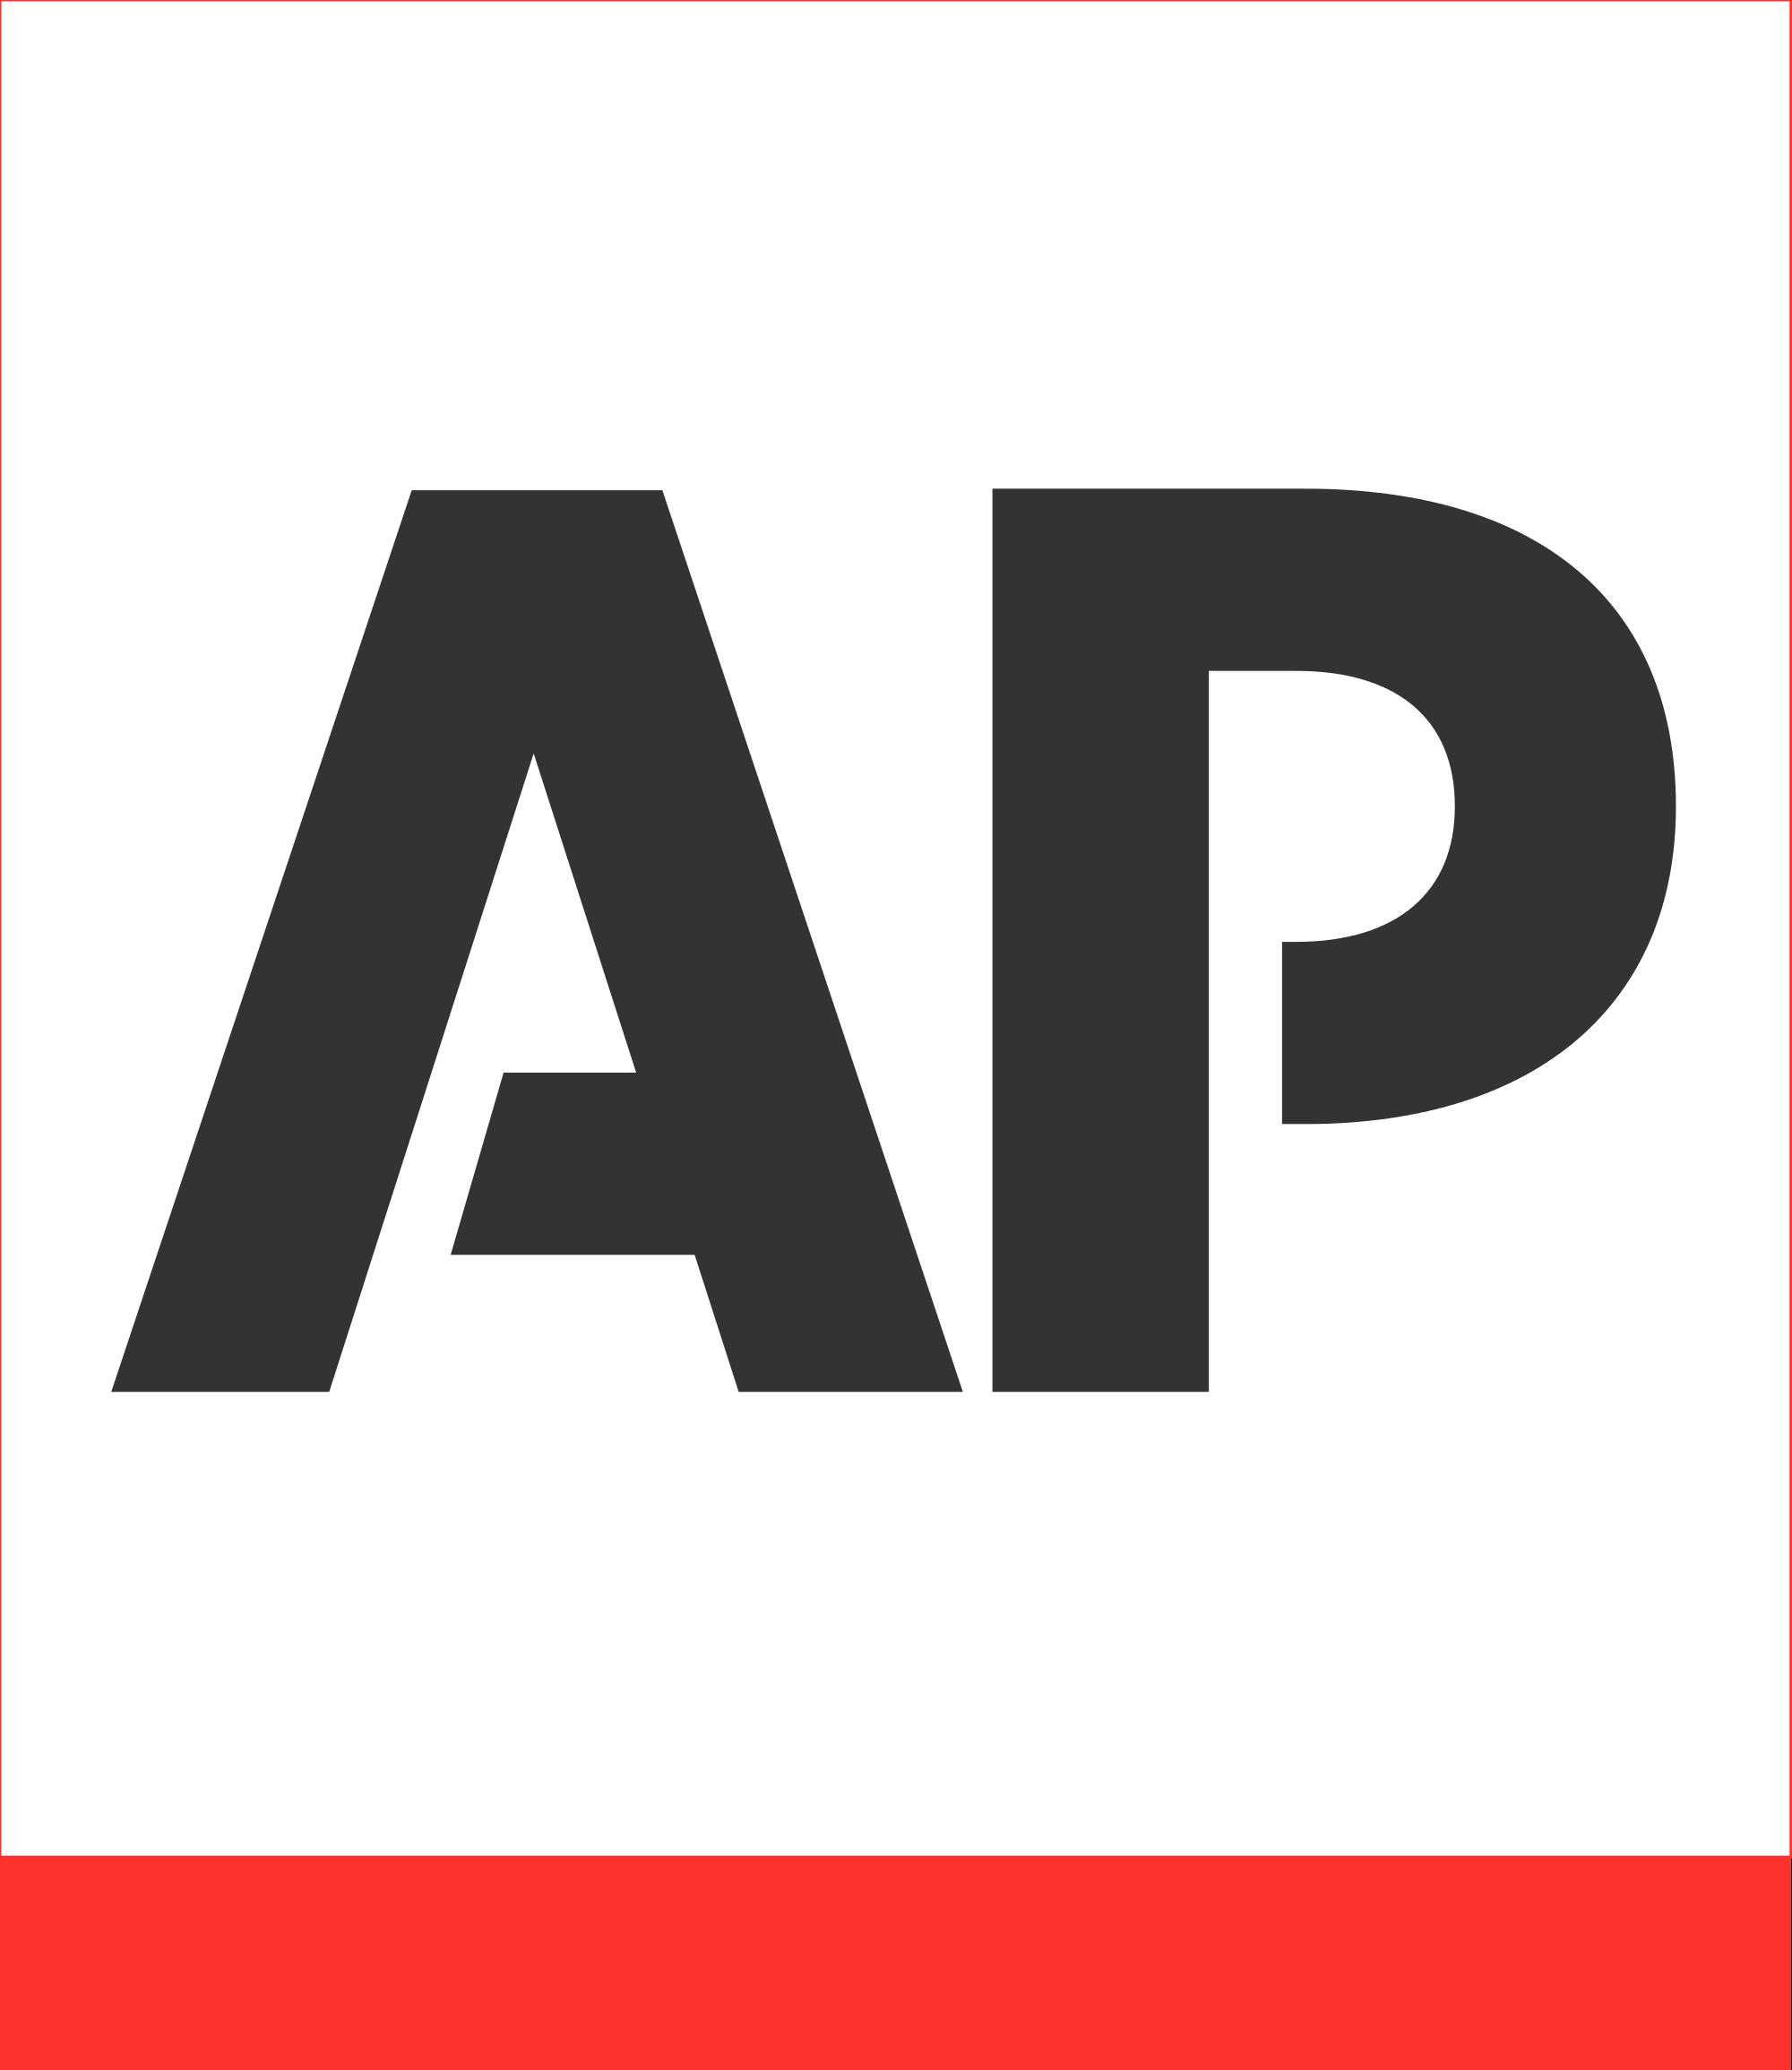 associated_press_logo_2012-svg